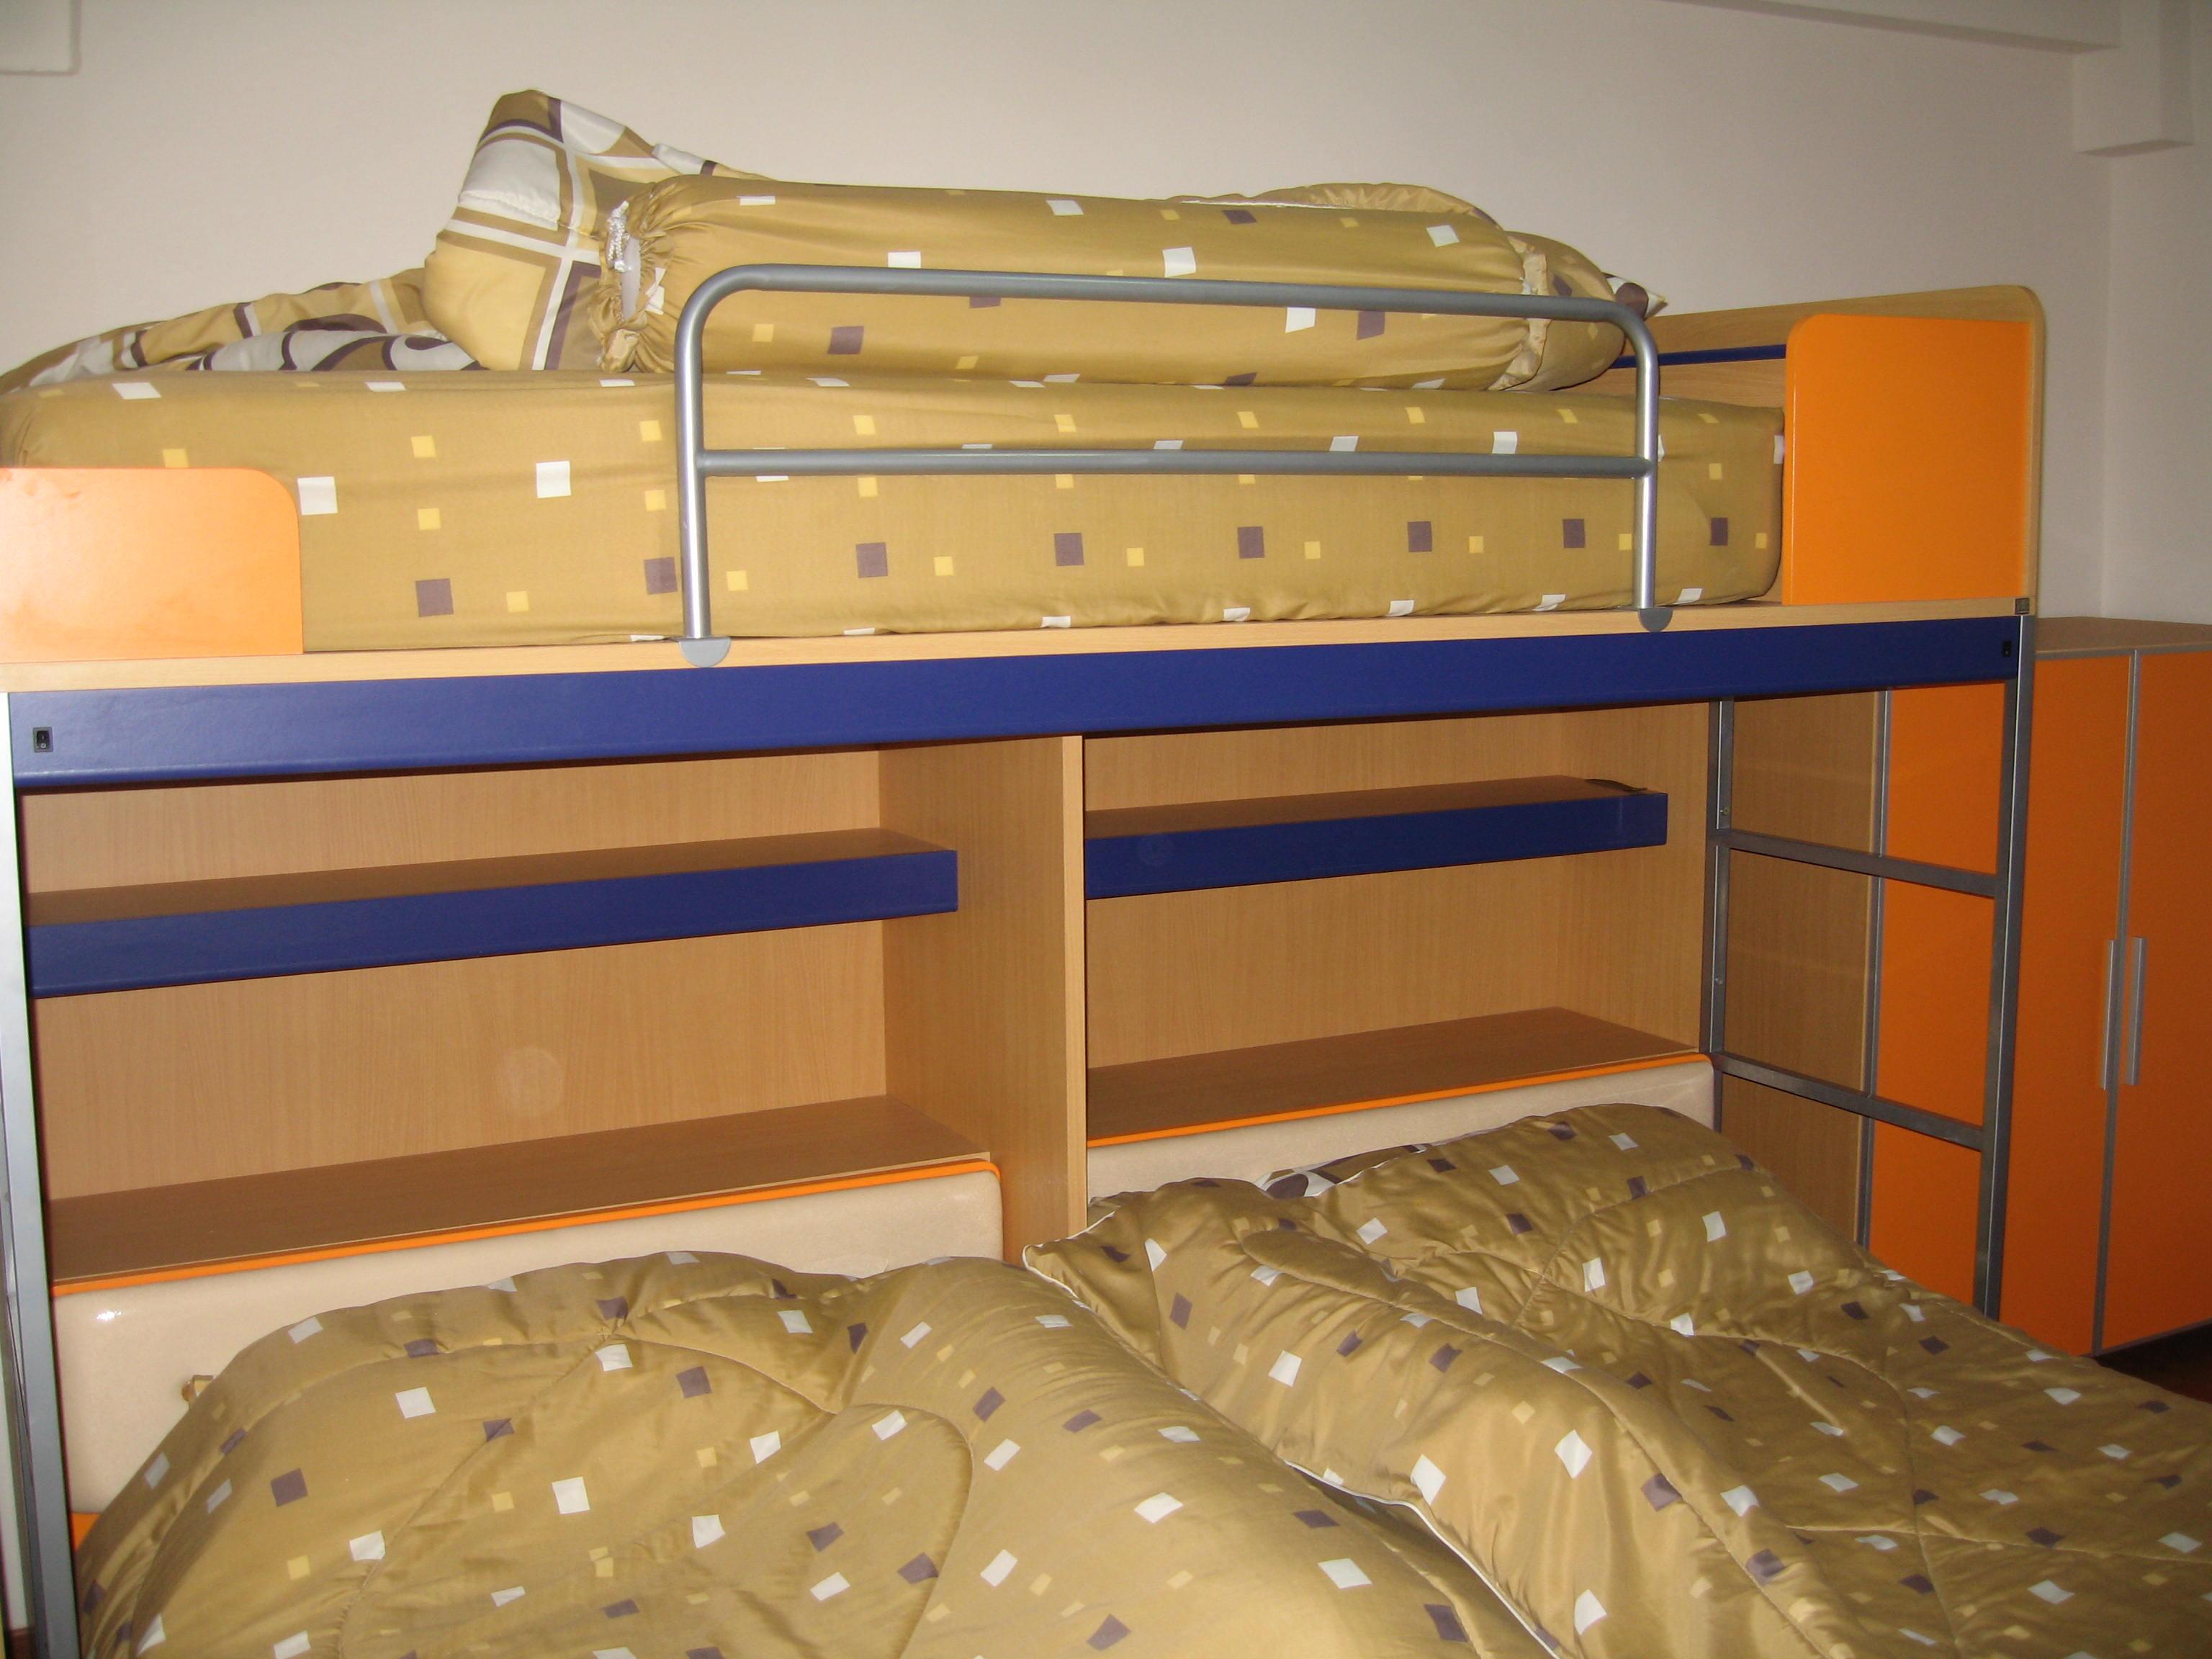 Millford Paradize. Апартаменты 3 спальни с панорамным видом на море.